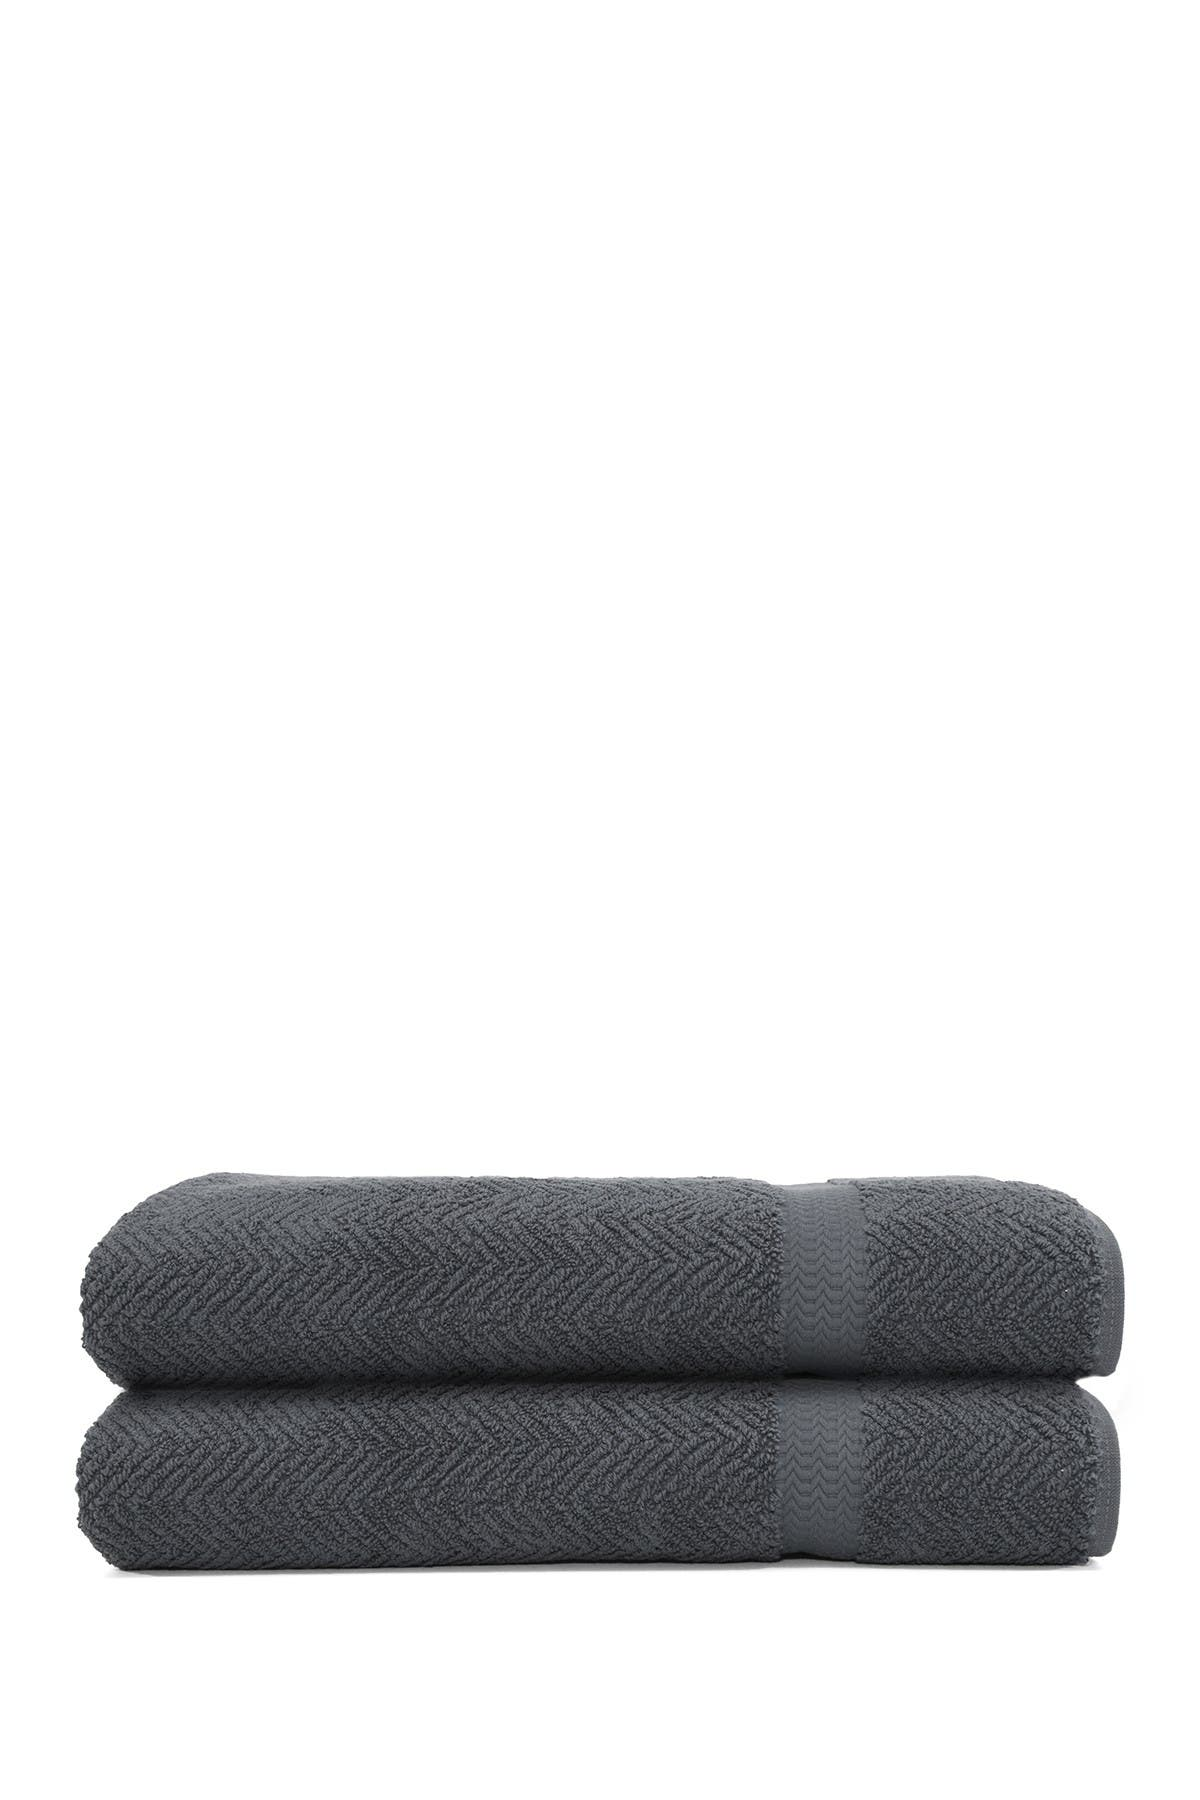 Image of LINUM TOWELS Grey Herringbone Bath Sheet - Set of 2